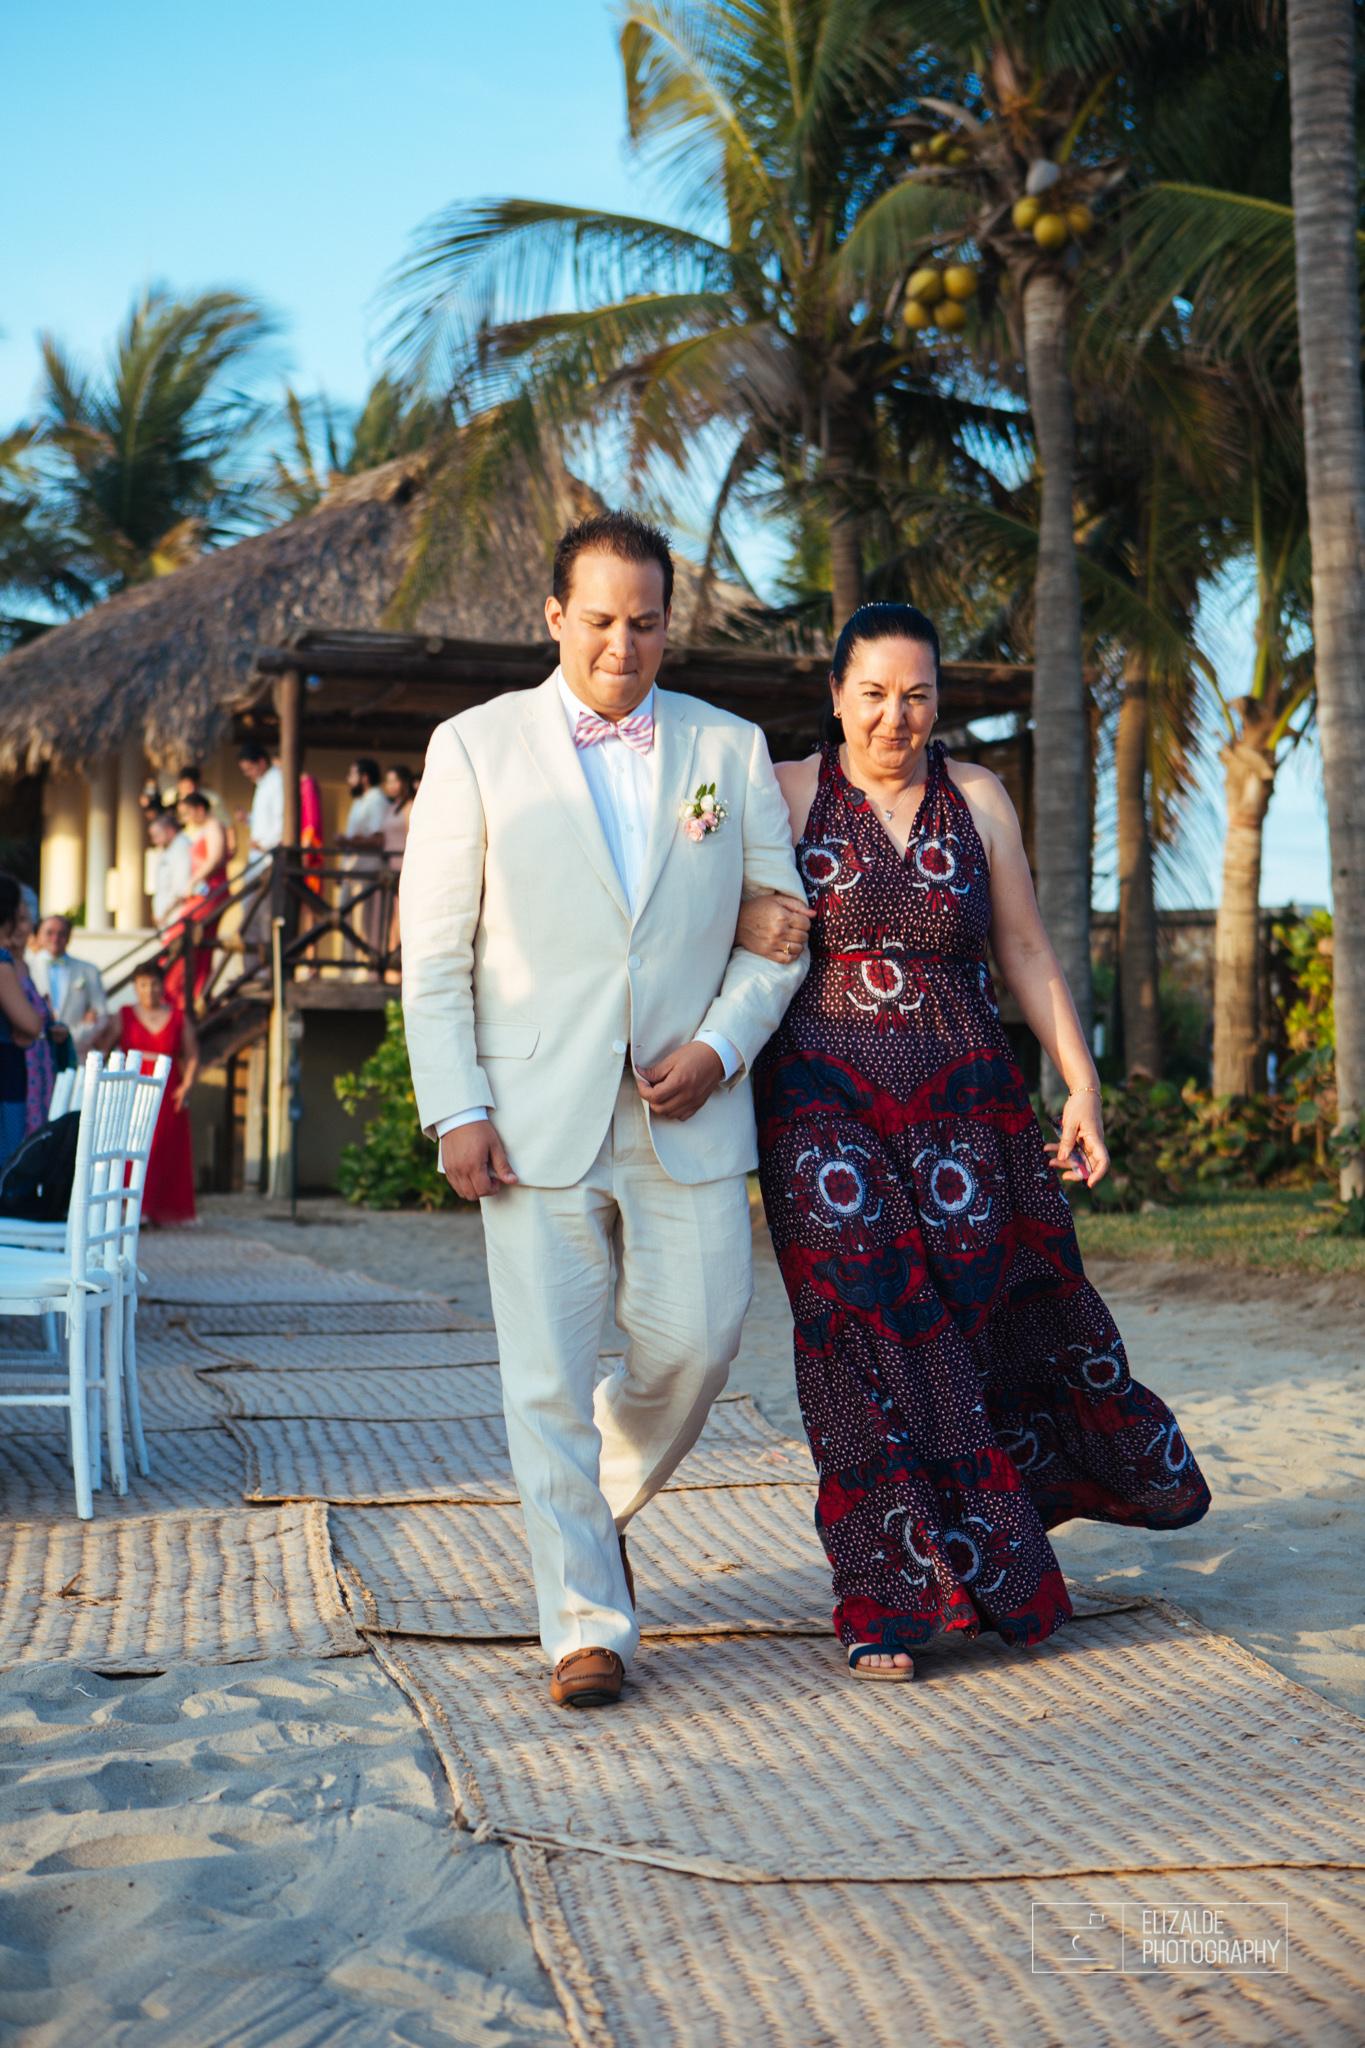 Pay and Ferran_Acapulco_Destination Wedding_Elizalde Photography-75.jpg